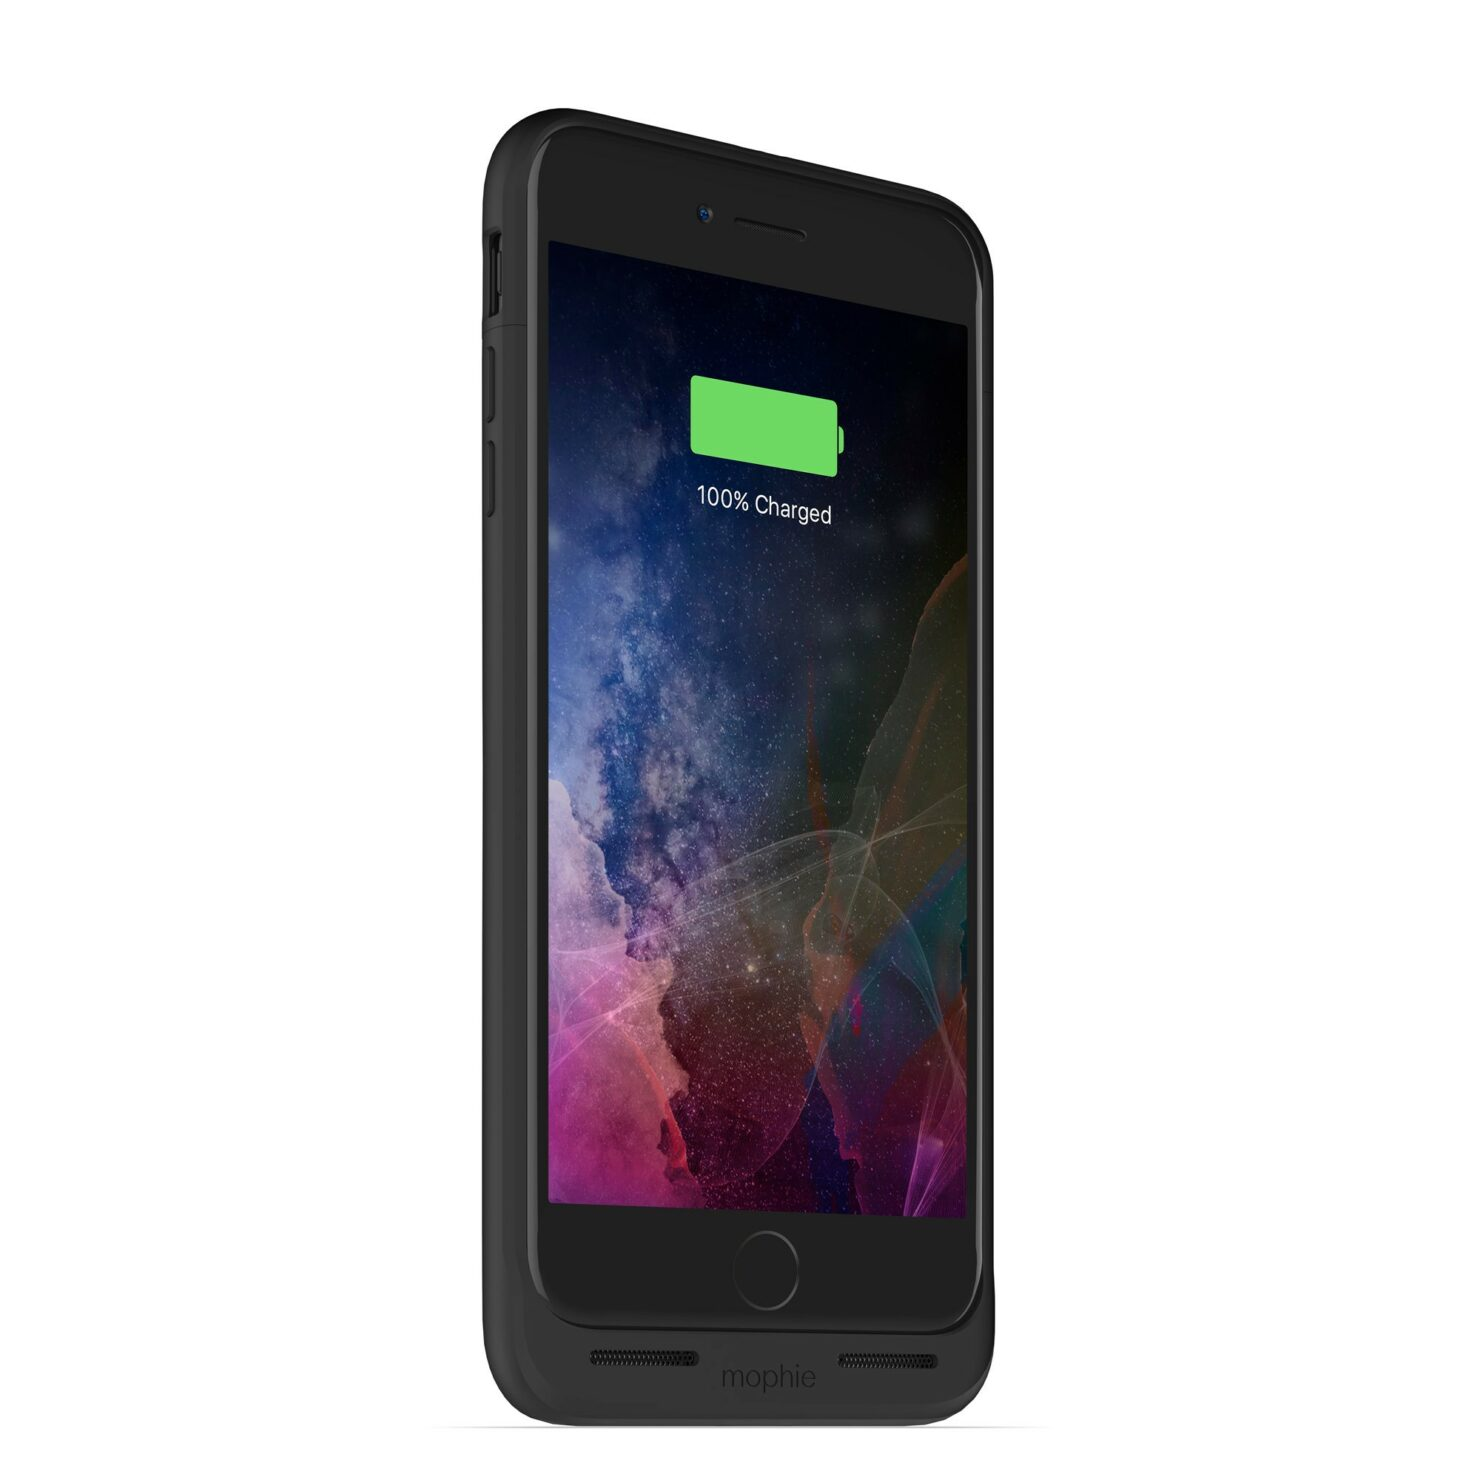 mophie-iphone-7-plus-3